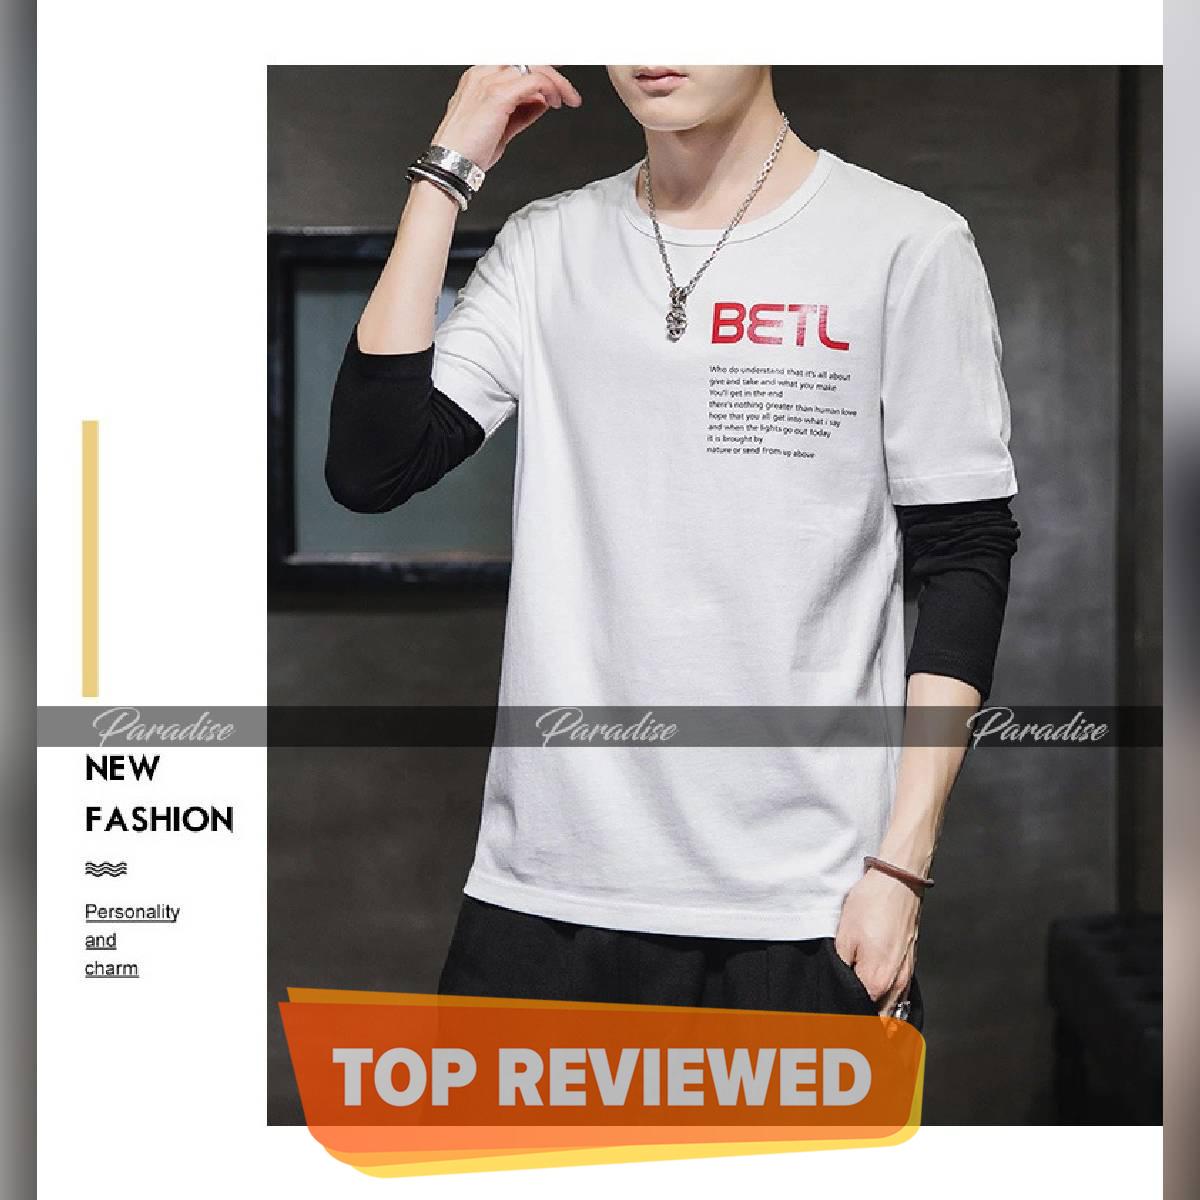 New Long Sleeves Printed Tshirts For Men